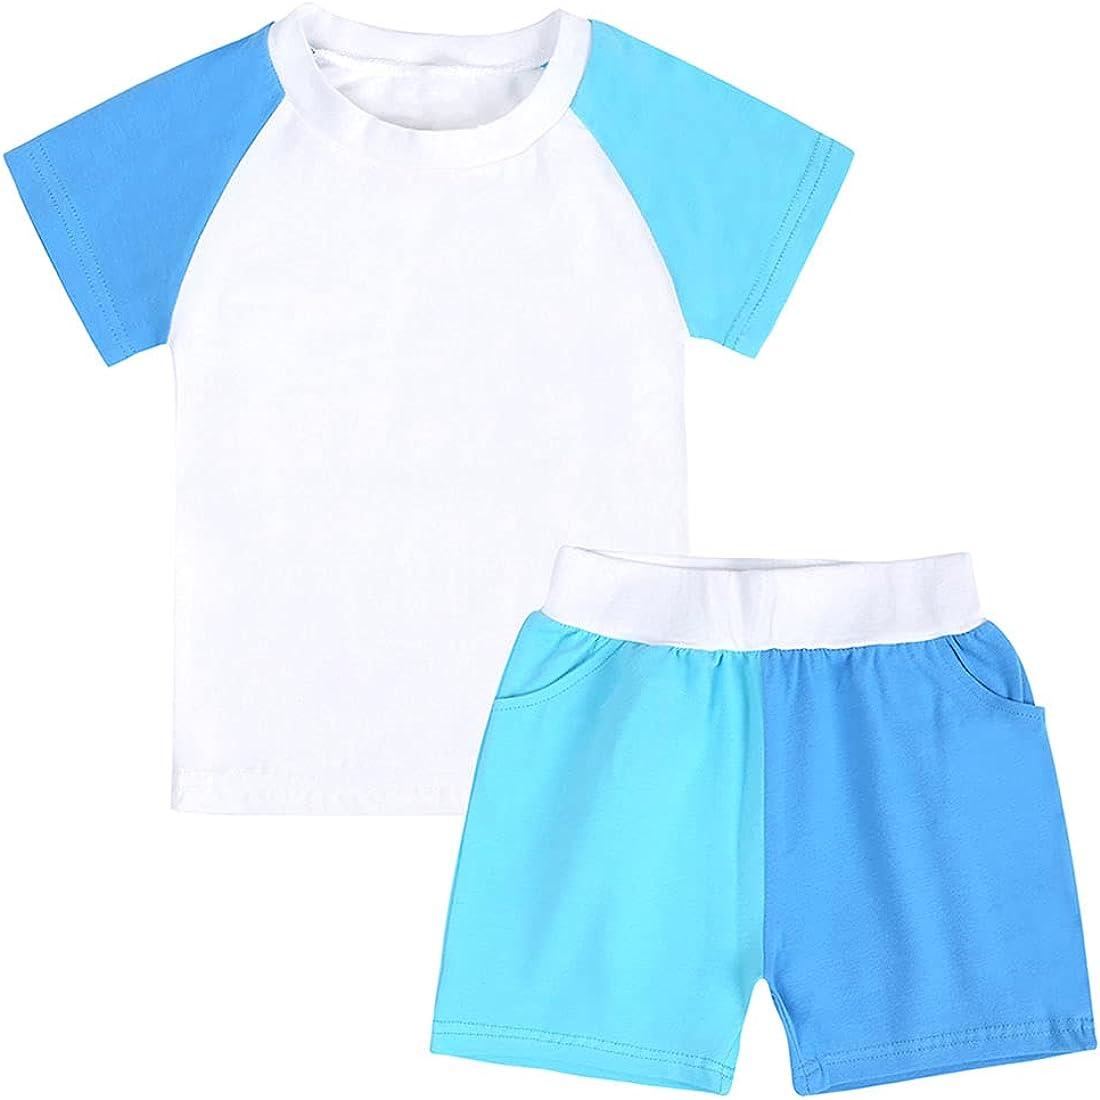 Baby Boys Girls Cotton Summer Shorts Set, Toddler Kids Color Contrast Short Sleeve Tee + Shorts 2PCS Clothes Set